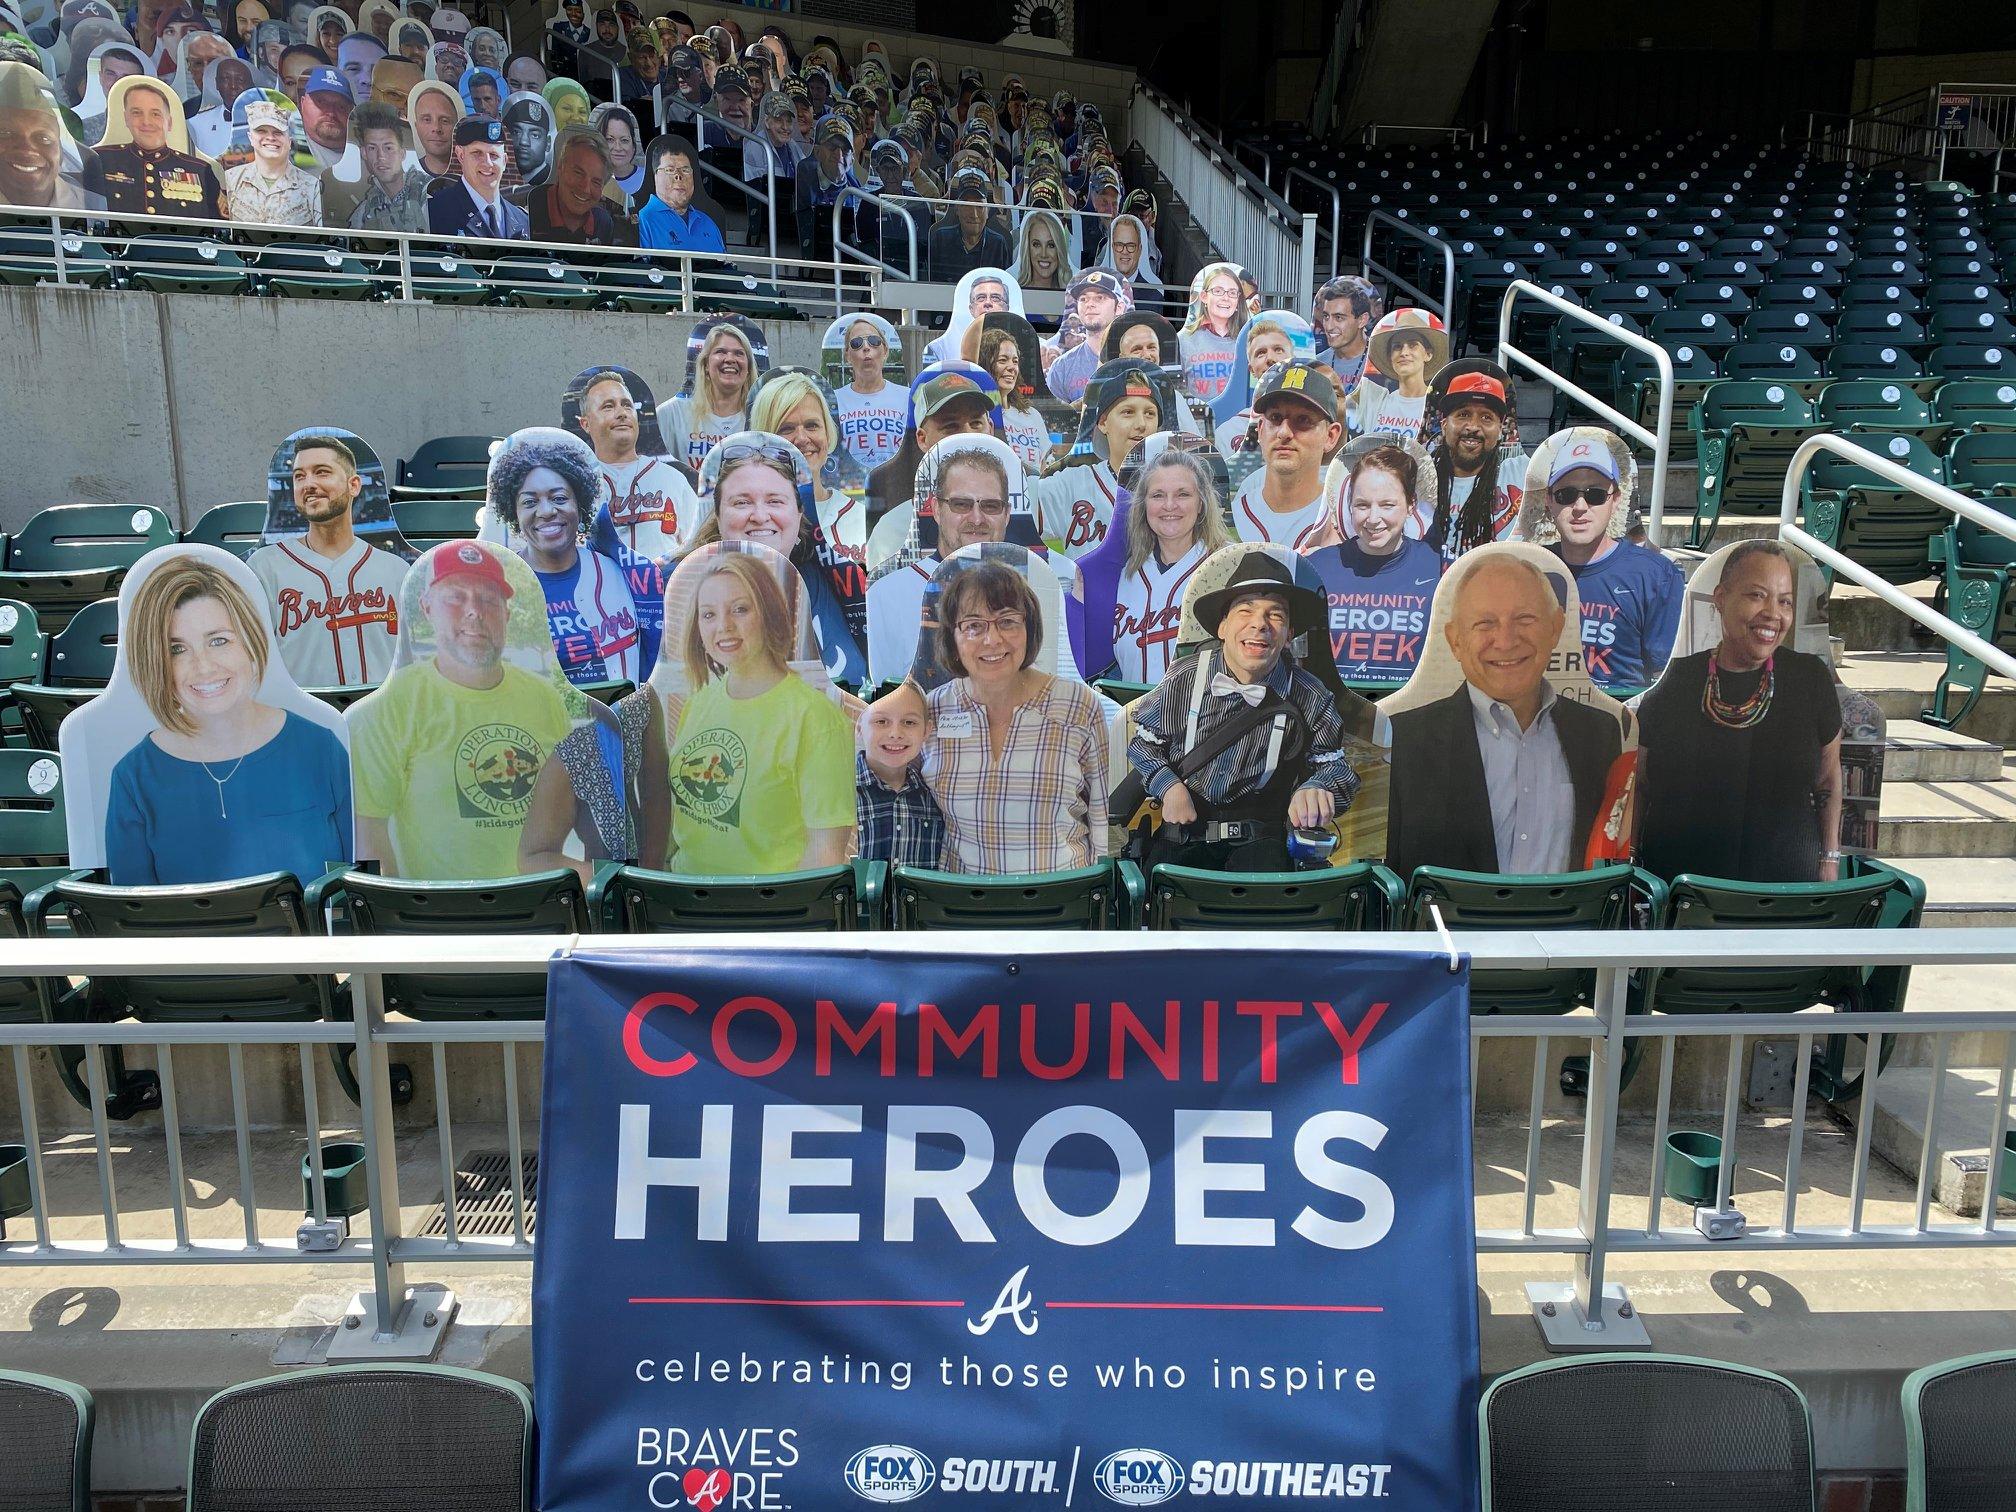 Atlanta Braves Foundation Community Heroes Award